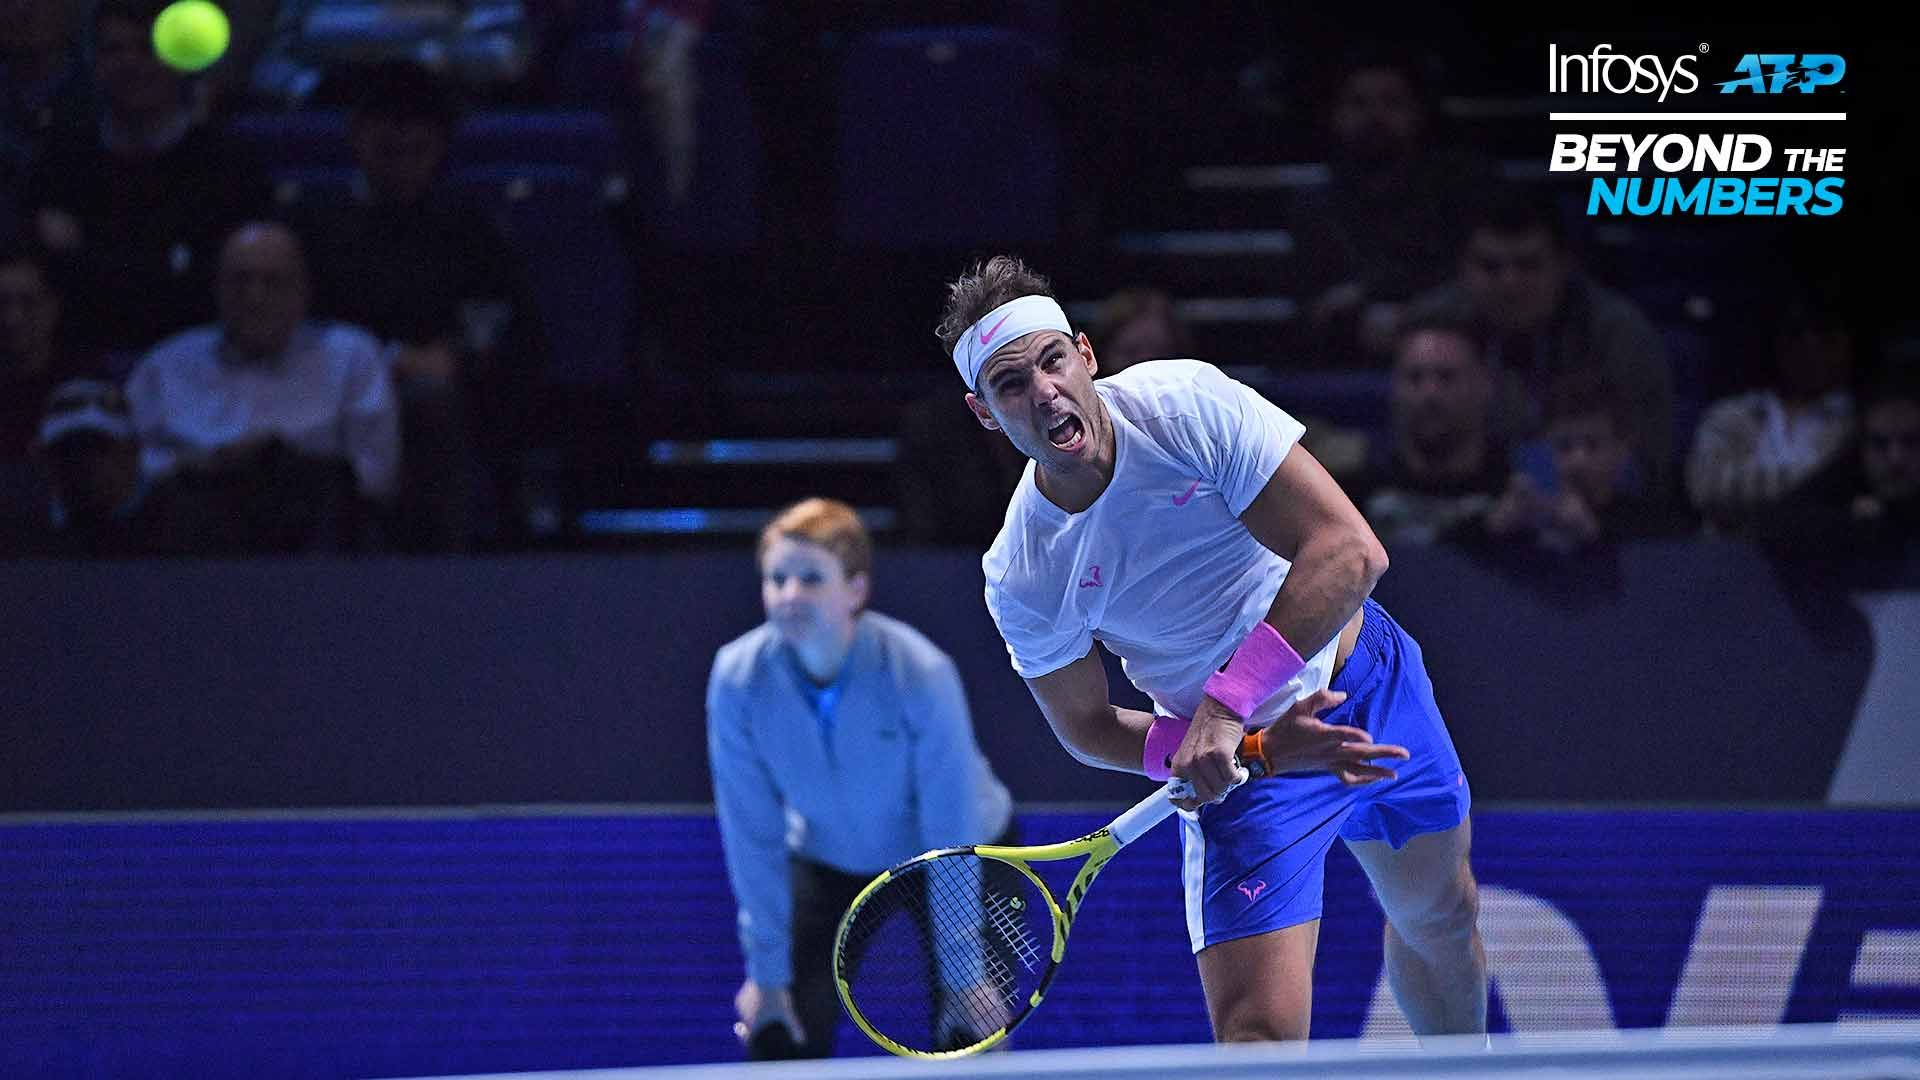 Go Inside Rafael Nadal S Mind When He S Serving Atp Tour Tennis Where Rafael Nadal Likes To Serve And When Rafael Nadal Roger Federer Sharapova Tennis